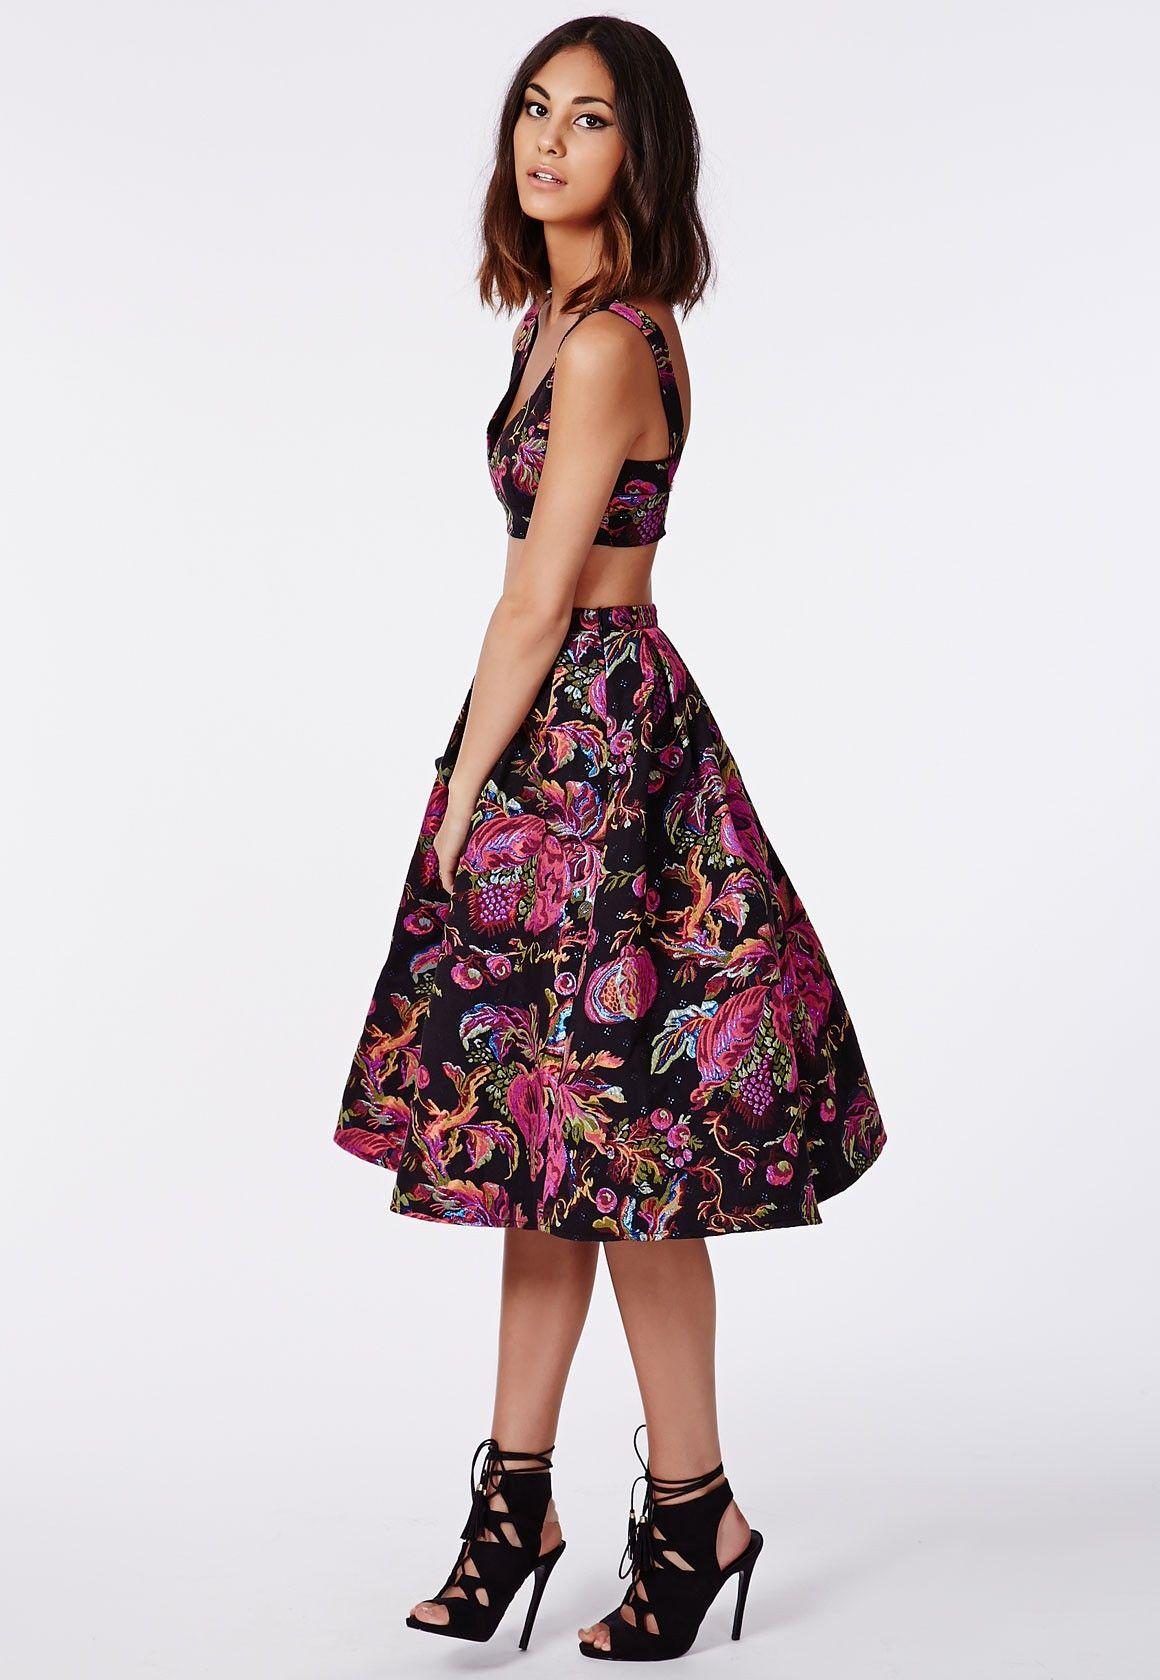 17 Best images about formal dress ideas on Pinterest | Shops, ASOS ...